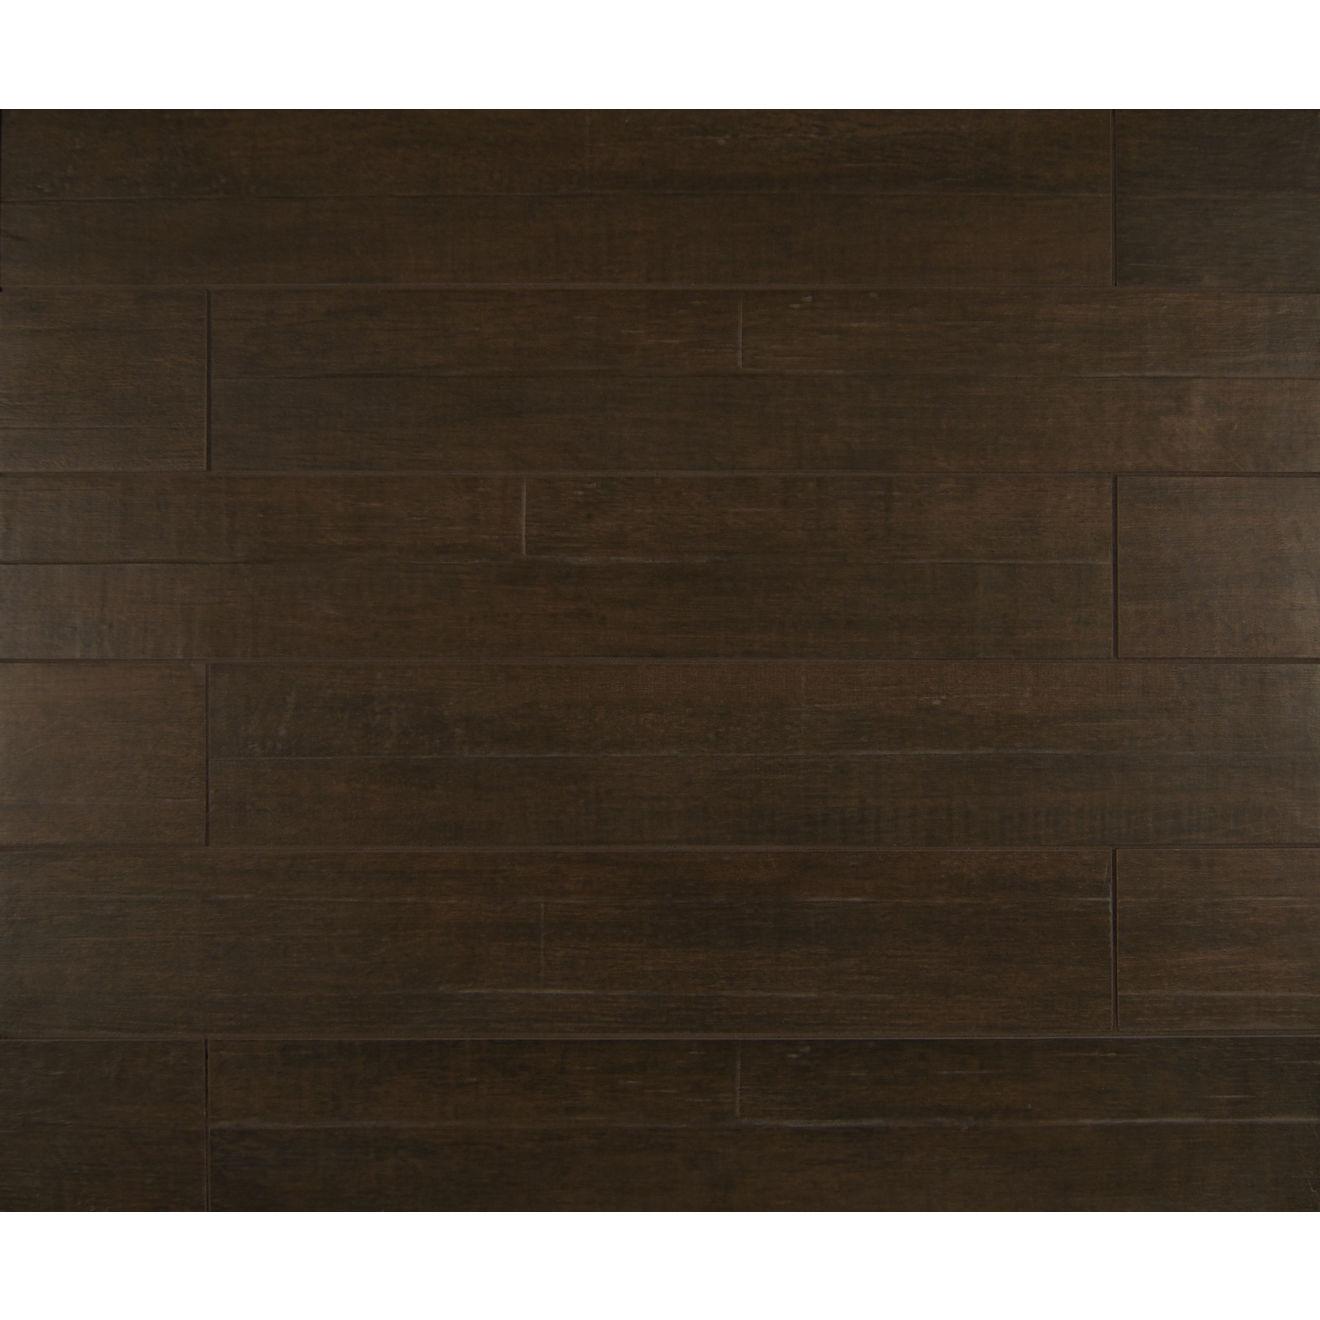 "Barrique 4"" x 24"" Floor & Wall Tile in Fonce"